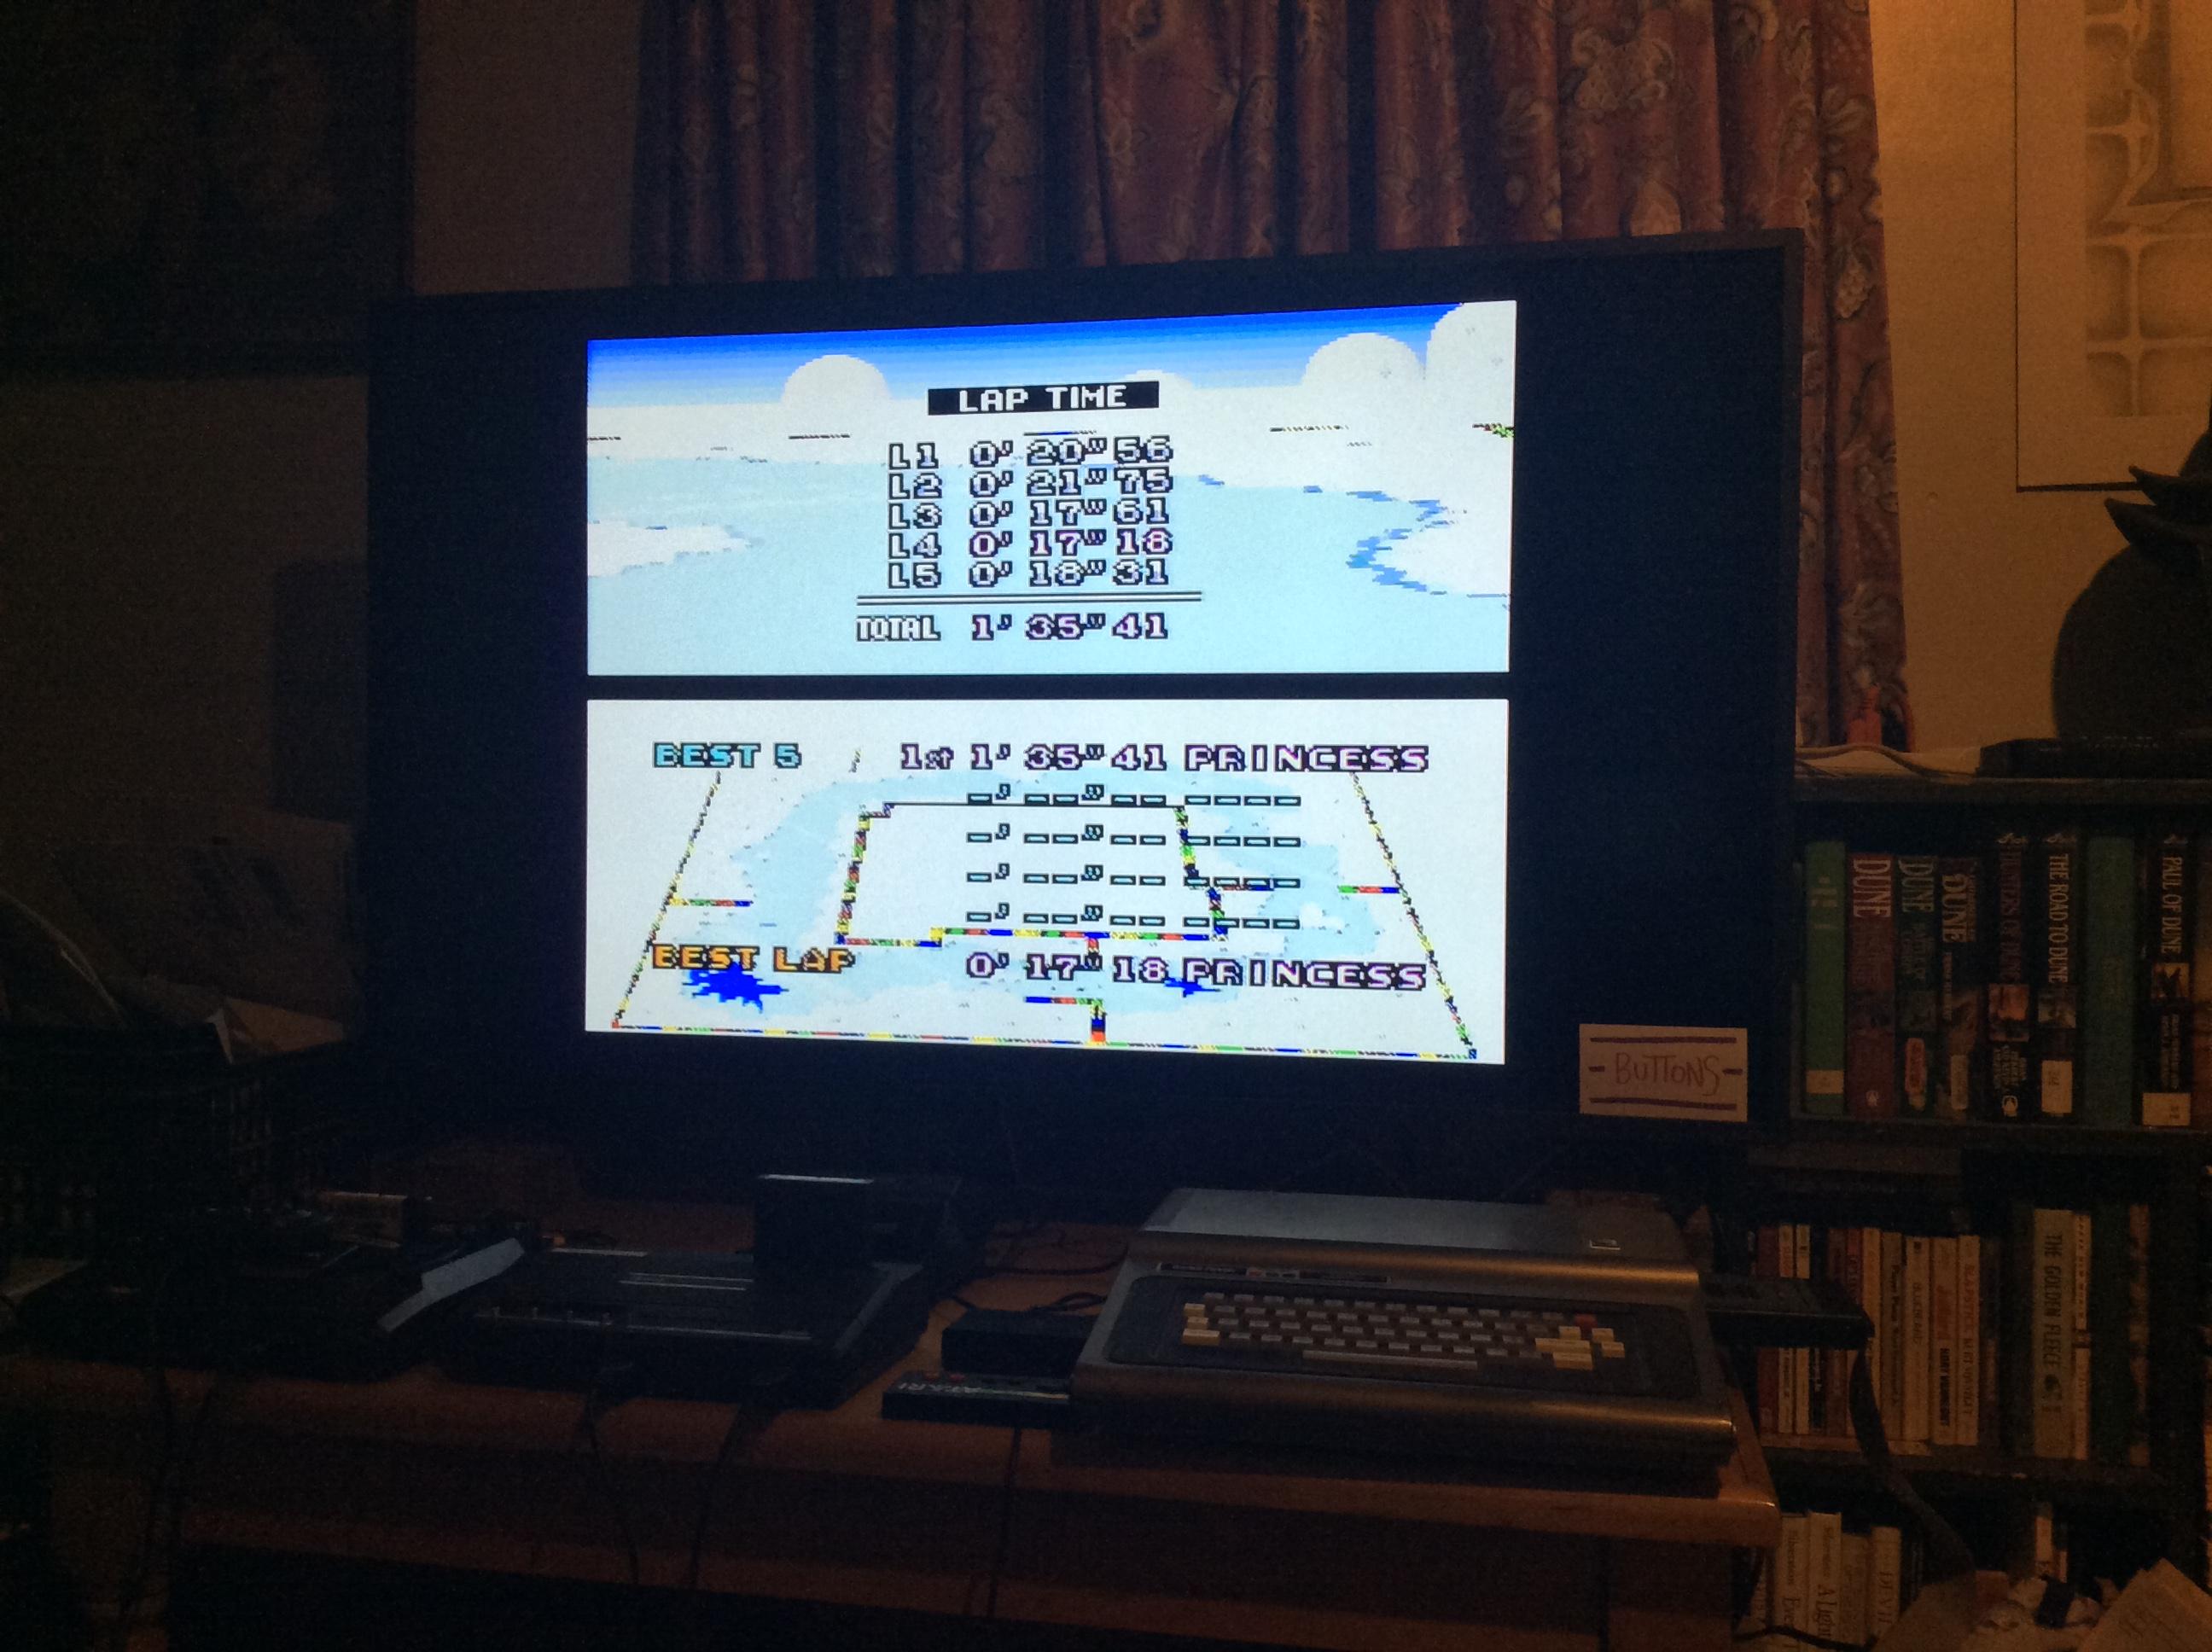 Super Mario Kart: Vanilla Lake 1 [Time Trial] time of 0:01:35.41